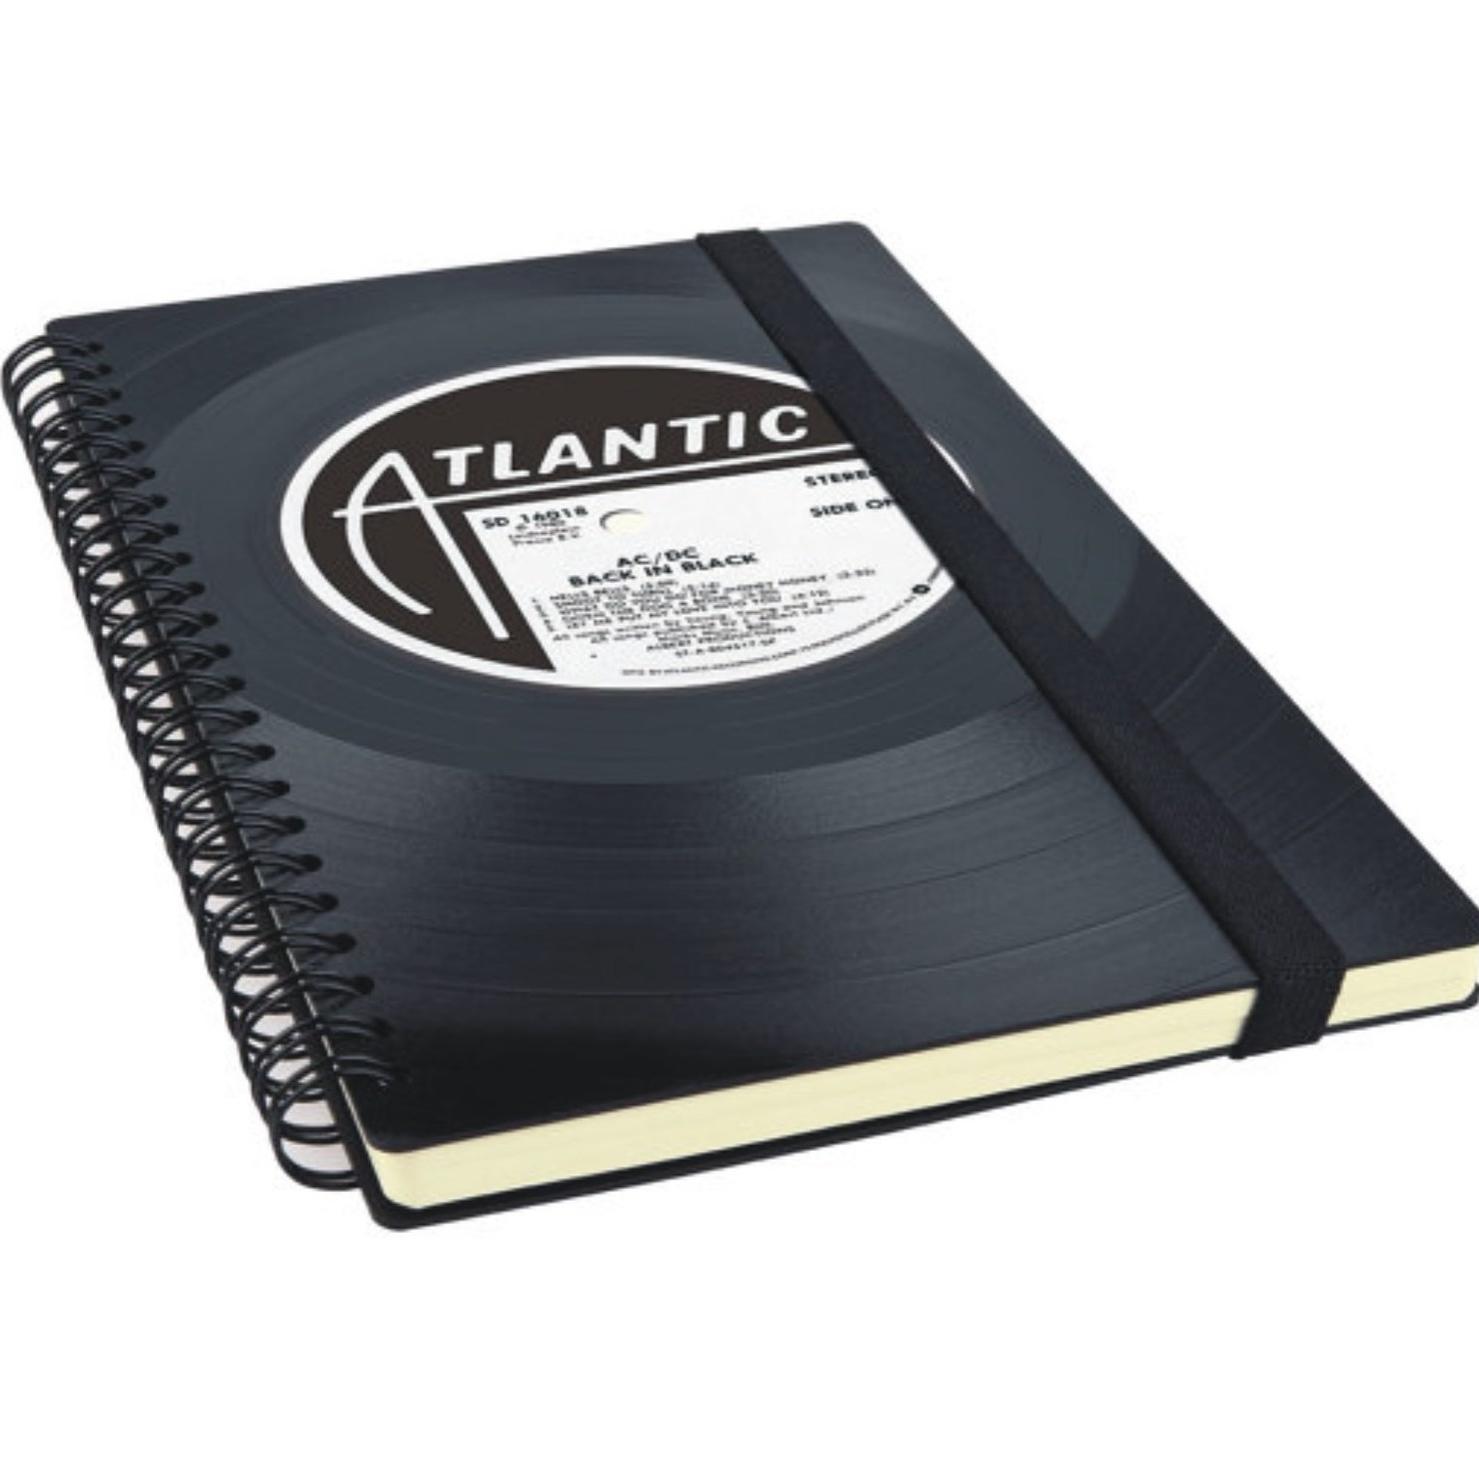 Vinyl Record Notebook $30